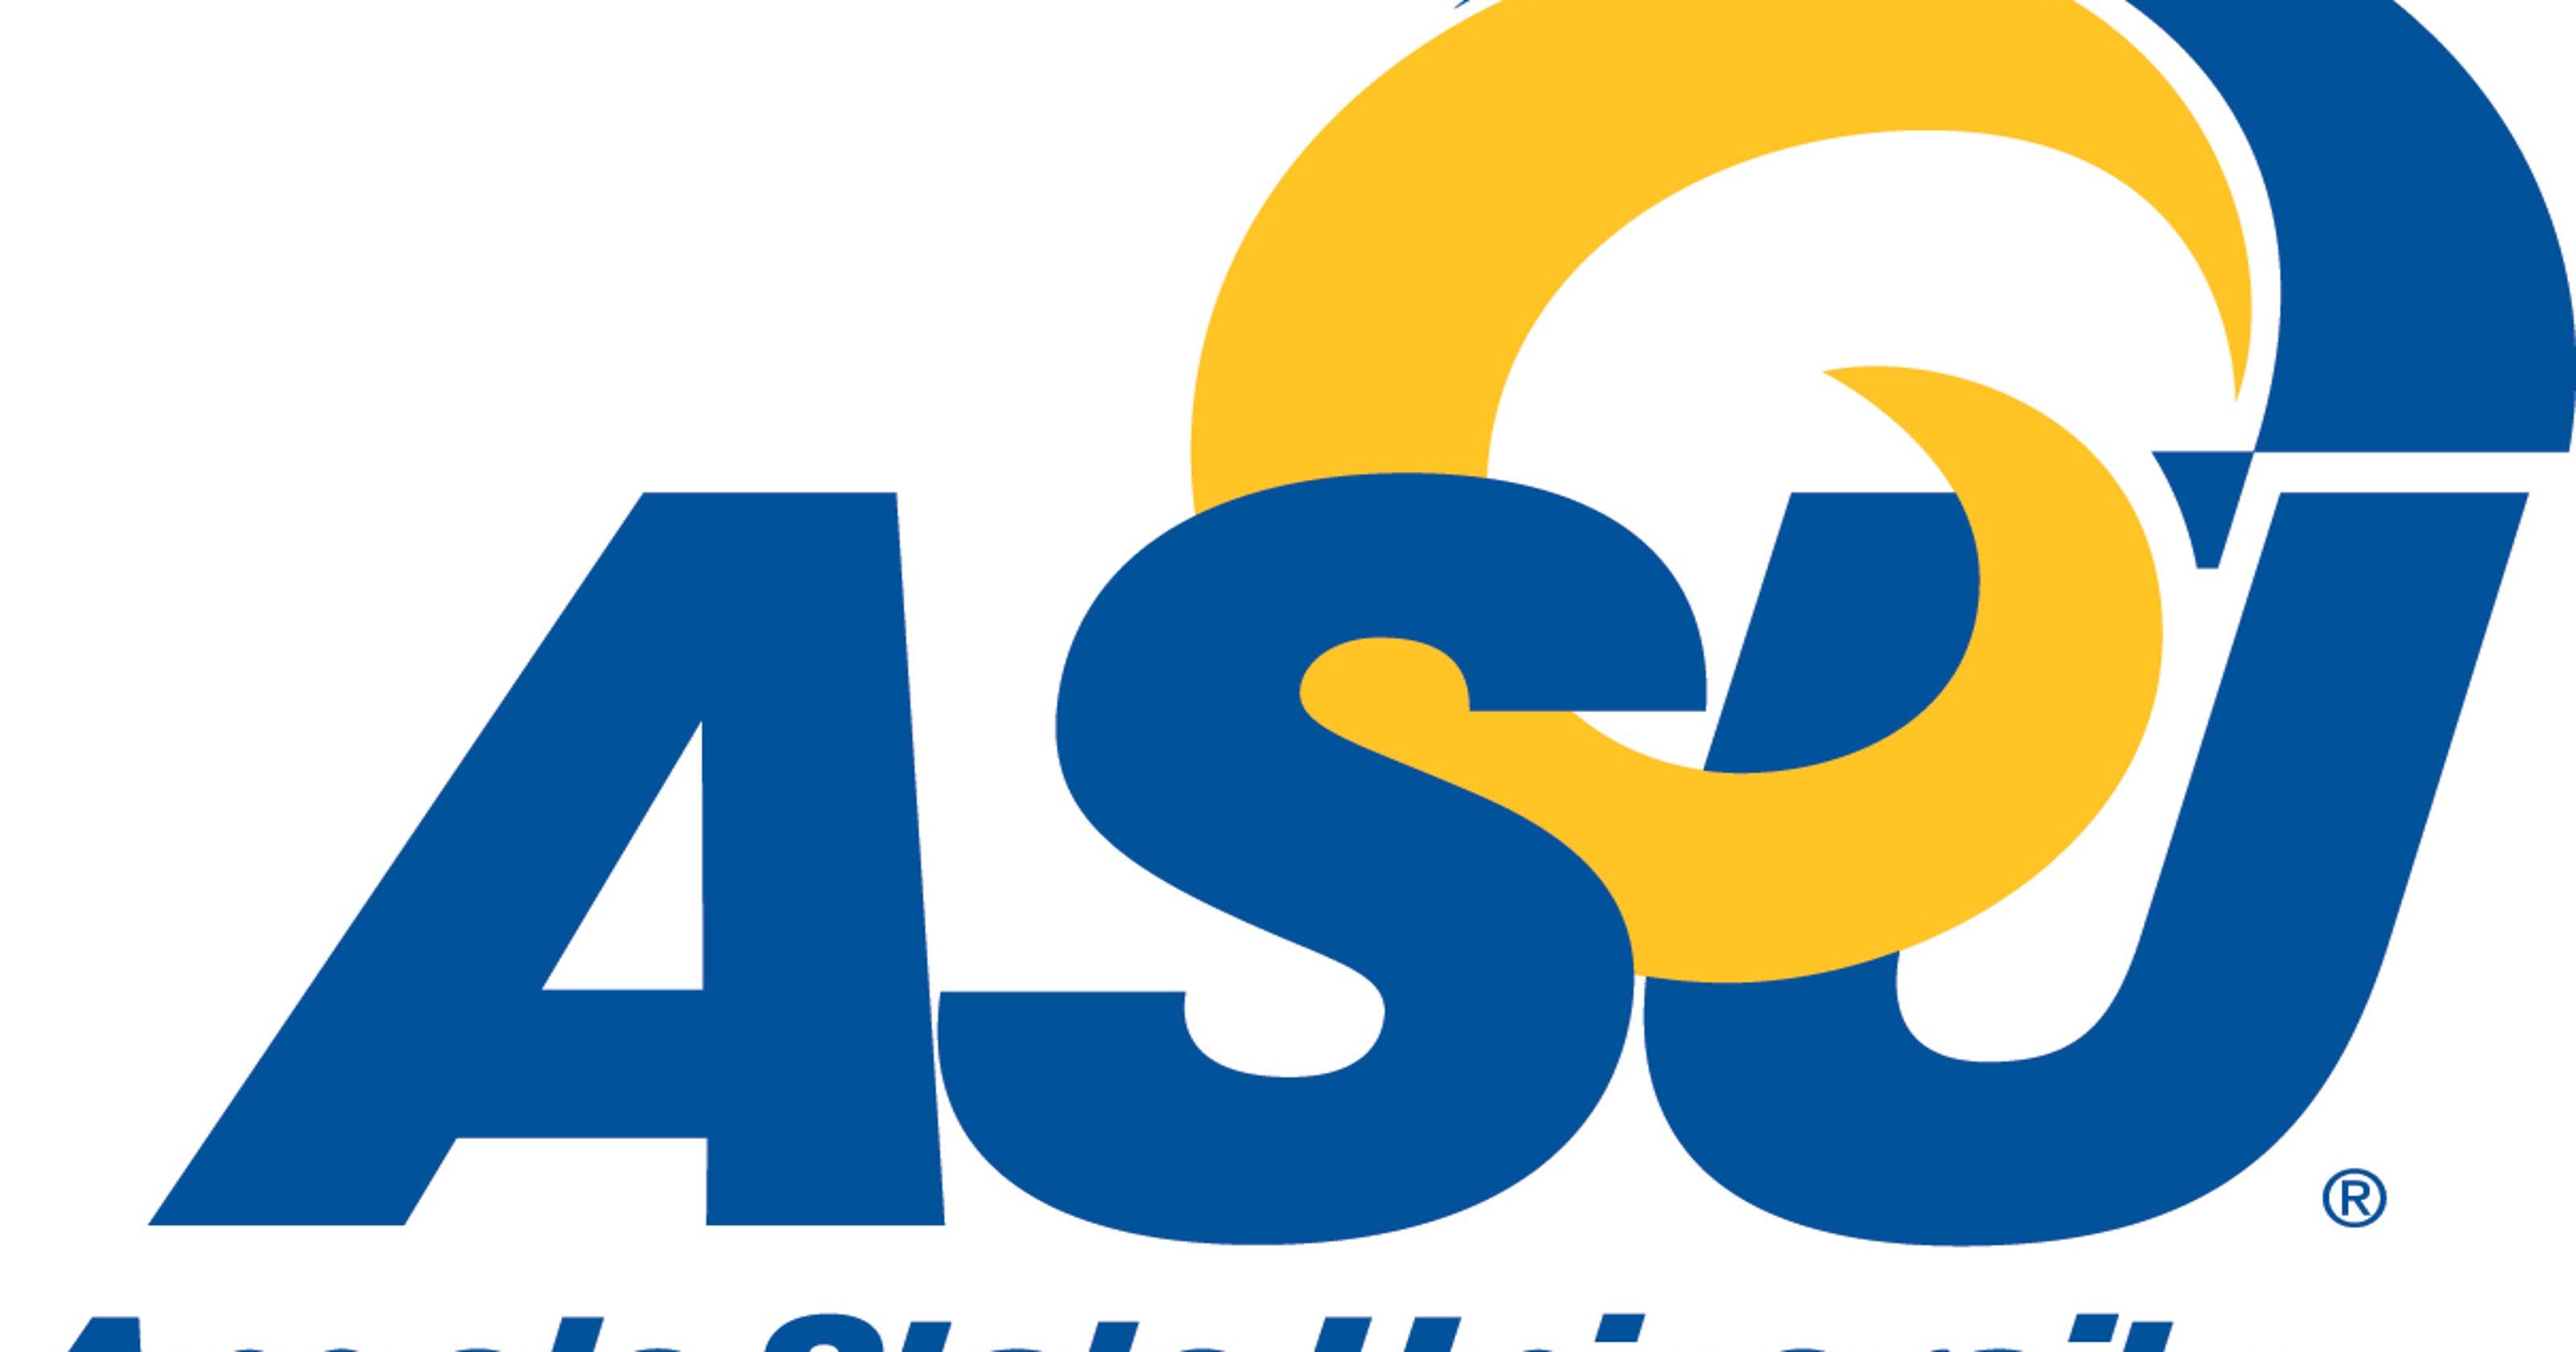 Asu Offers New Certificate Program